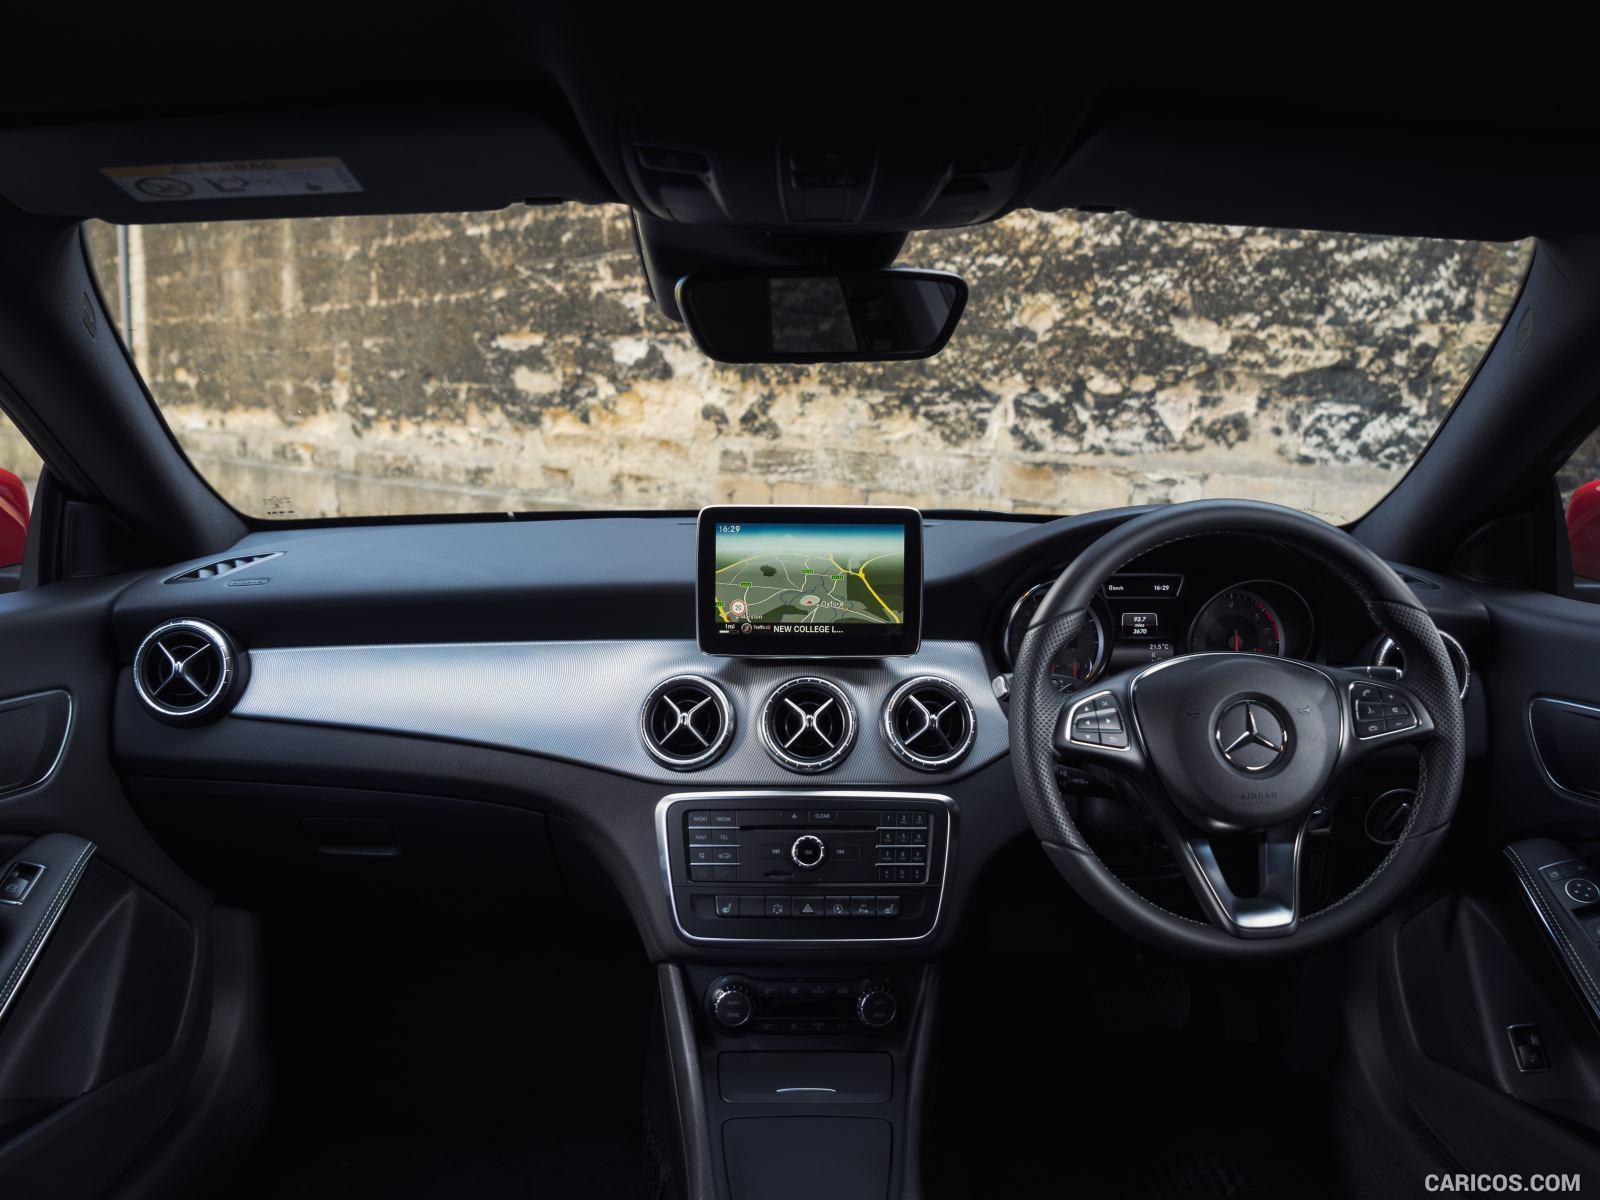 2015 Mercedes Benz CLA 200 CDI Shooting Brake UK Spec   Interior 1600x1200